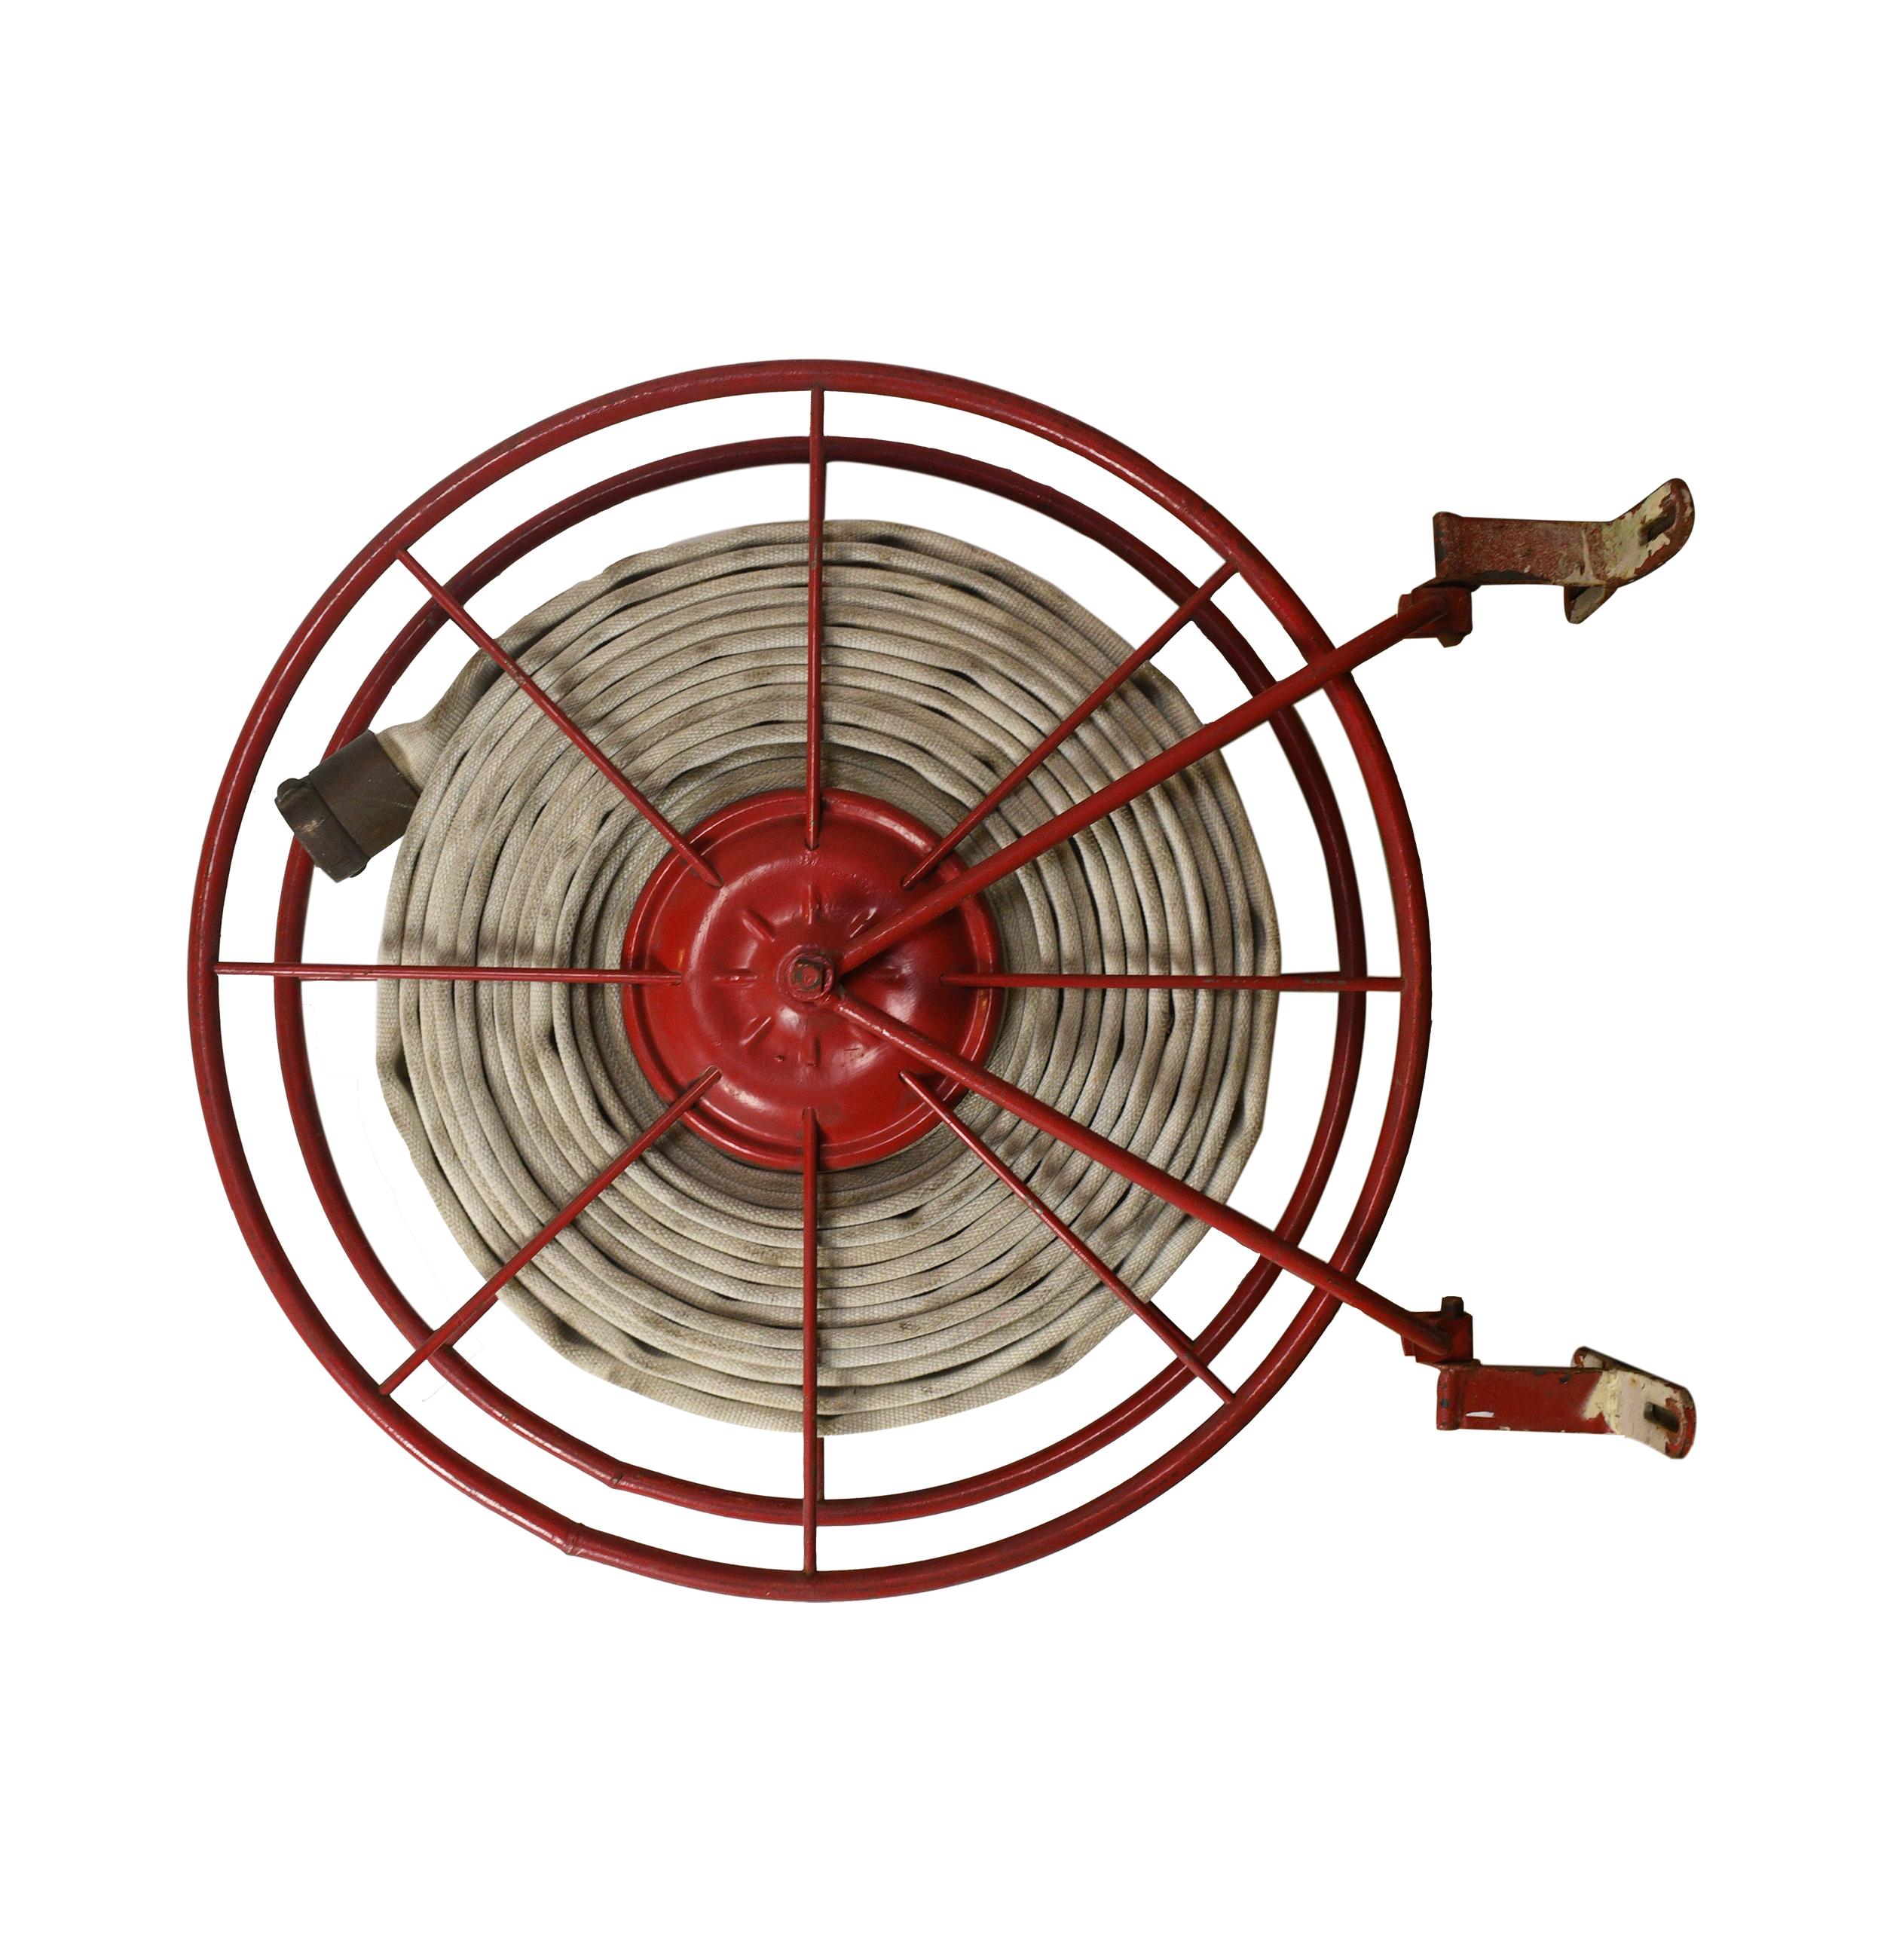 47862-fire-hose-wheel-16.jpg